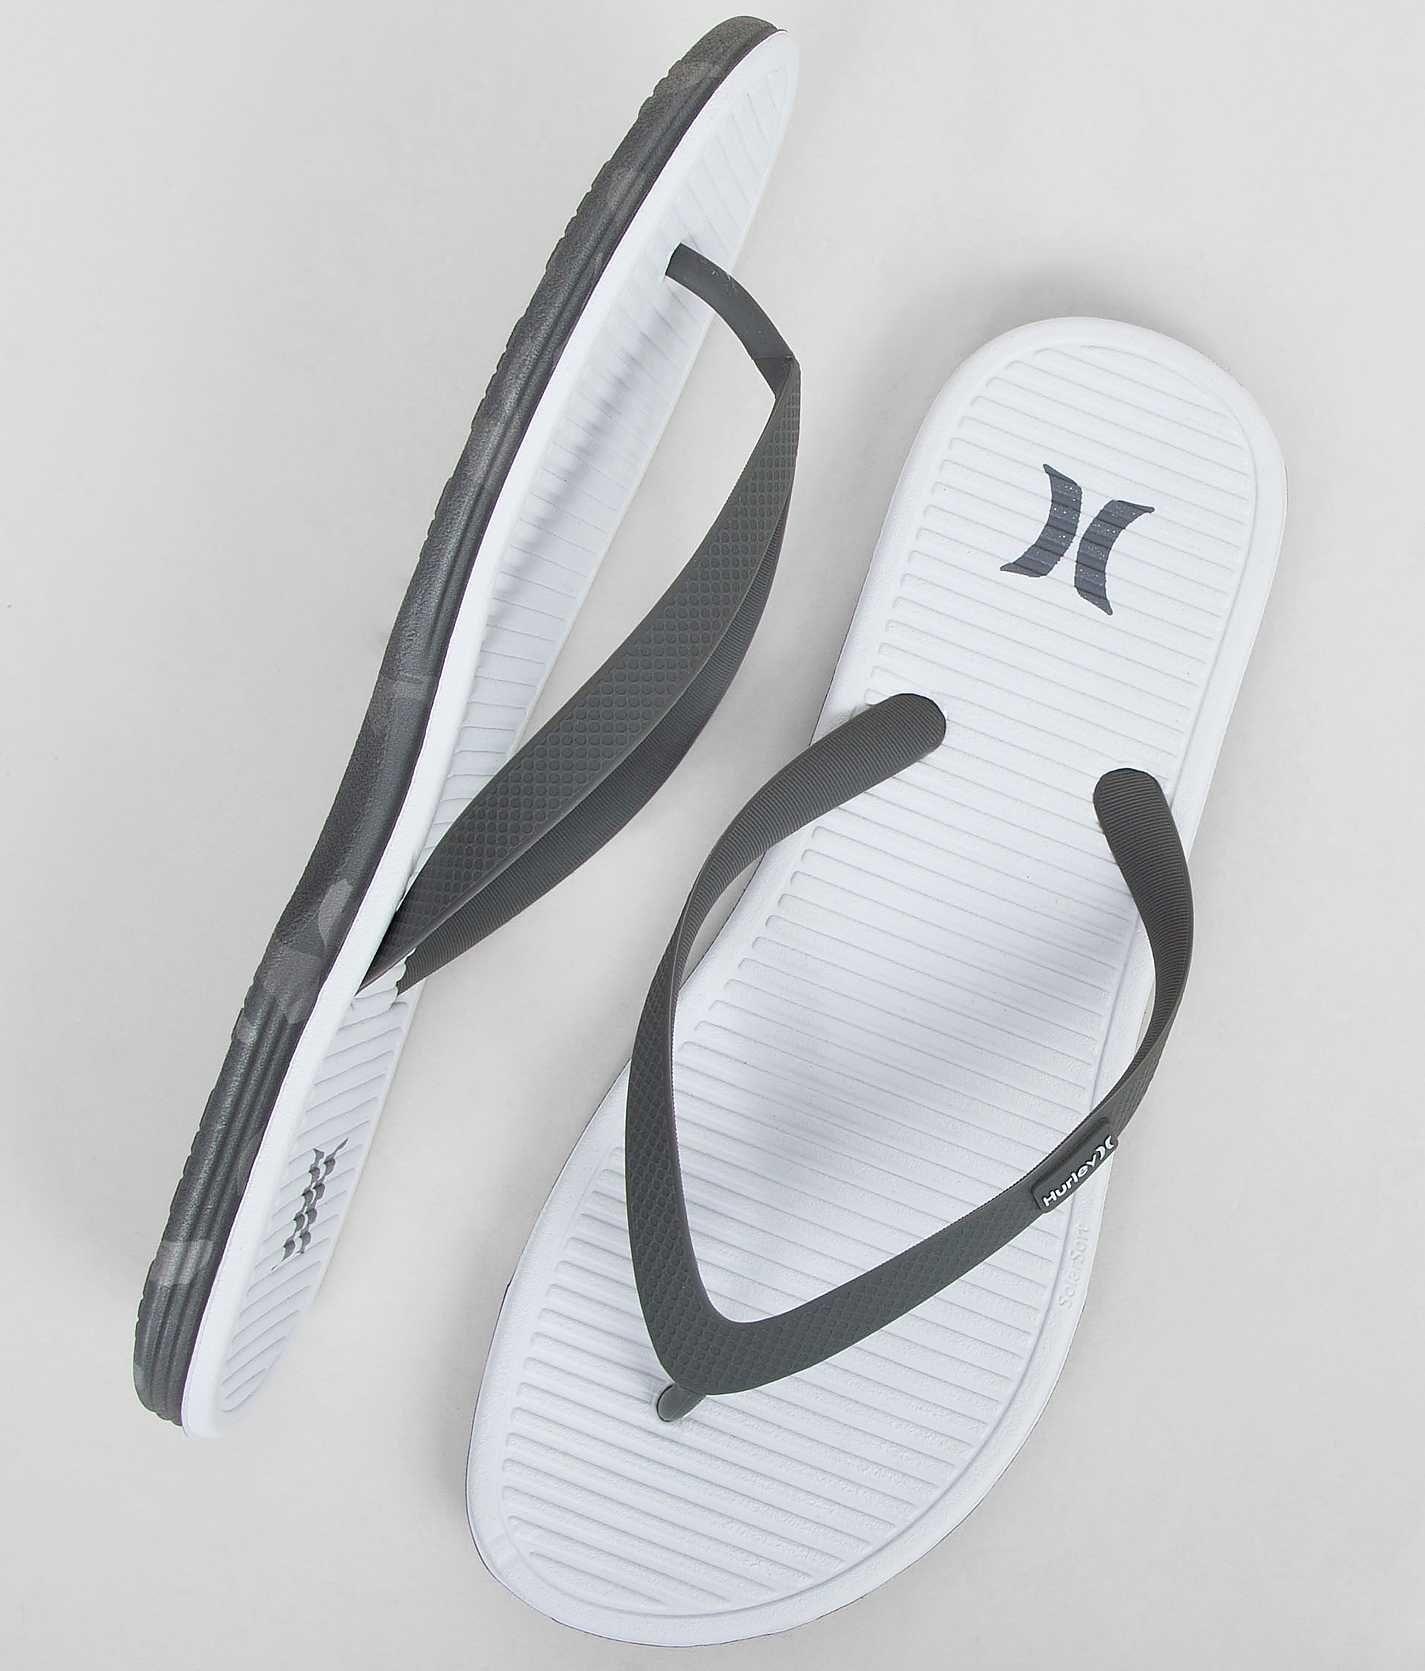 Hurley Solar Soft Flip - Men's Shoes in Camo